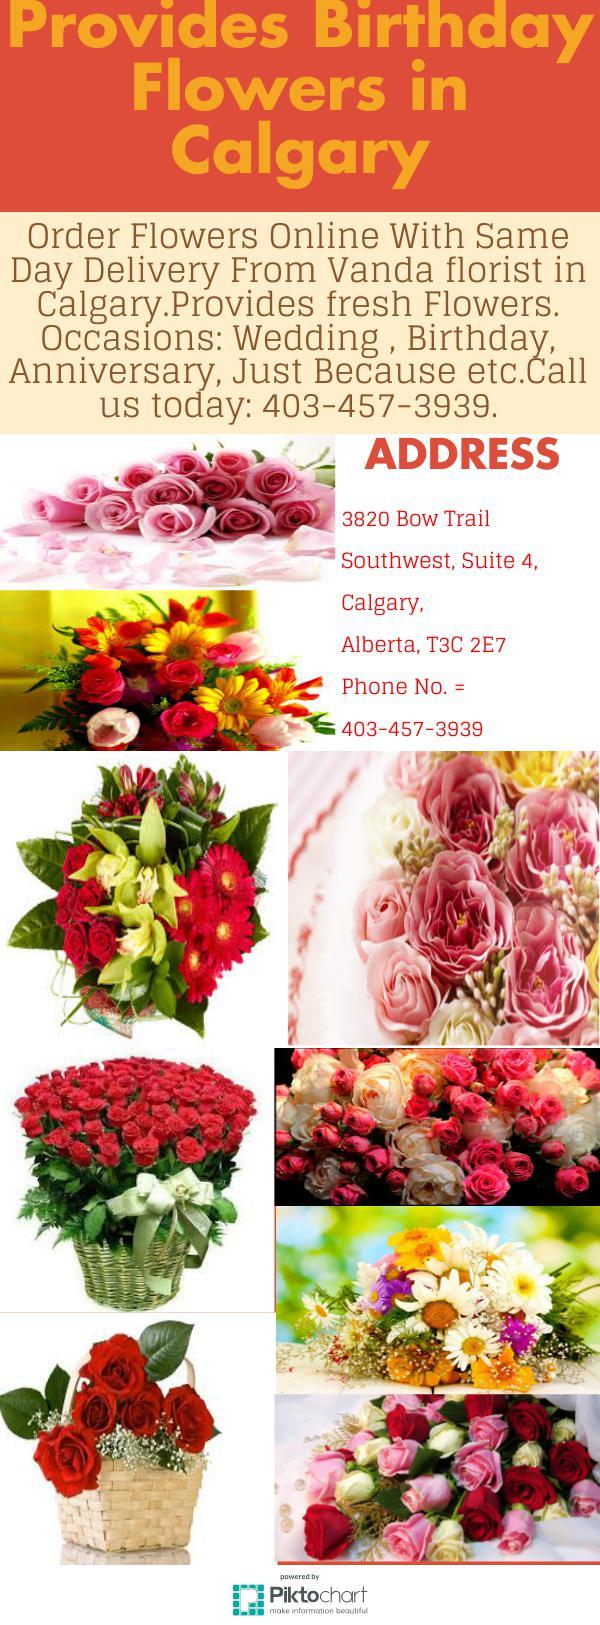 Provides birthday flowers in calgary piktochart visual editor izmirmasajfo